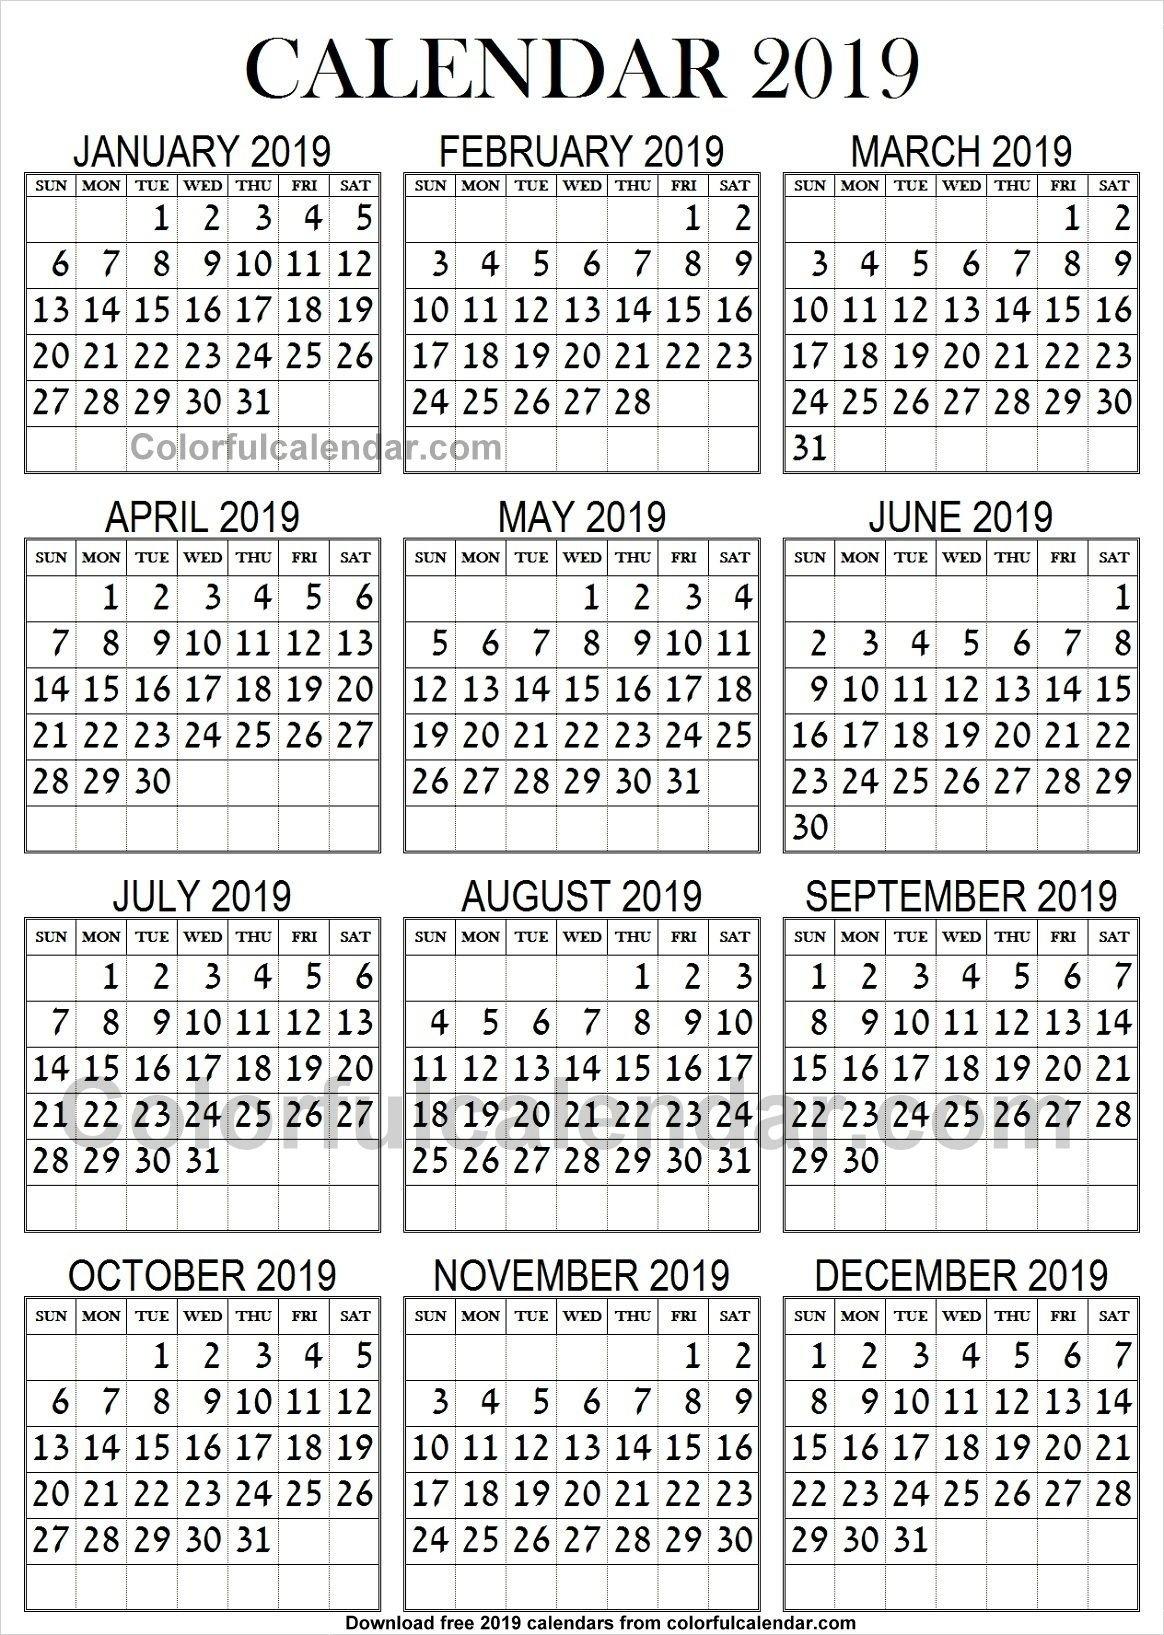 2019 Calendar Large Print | 2019 Yearly Calendars | Calendar, 2019 Calendar 2019 Large Print